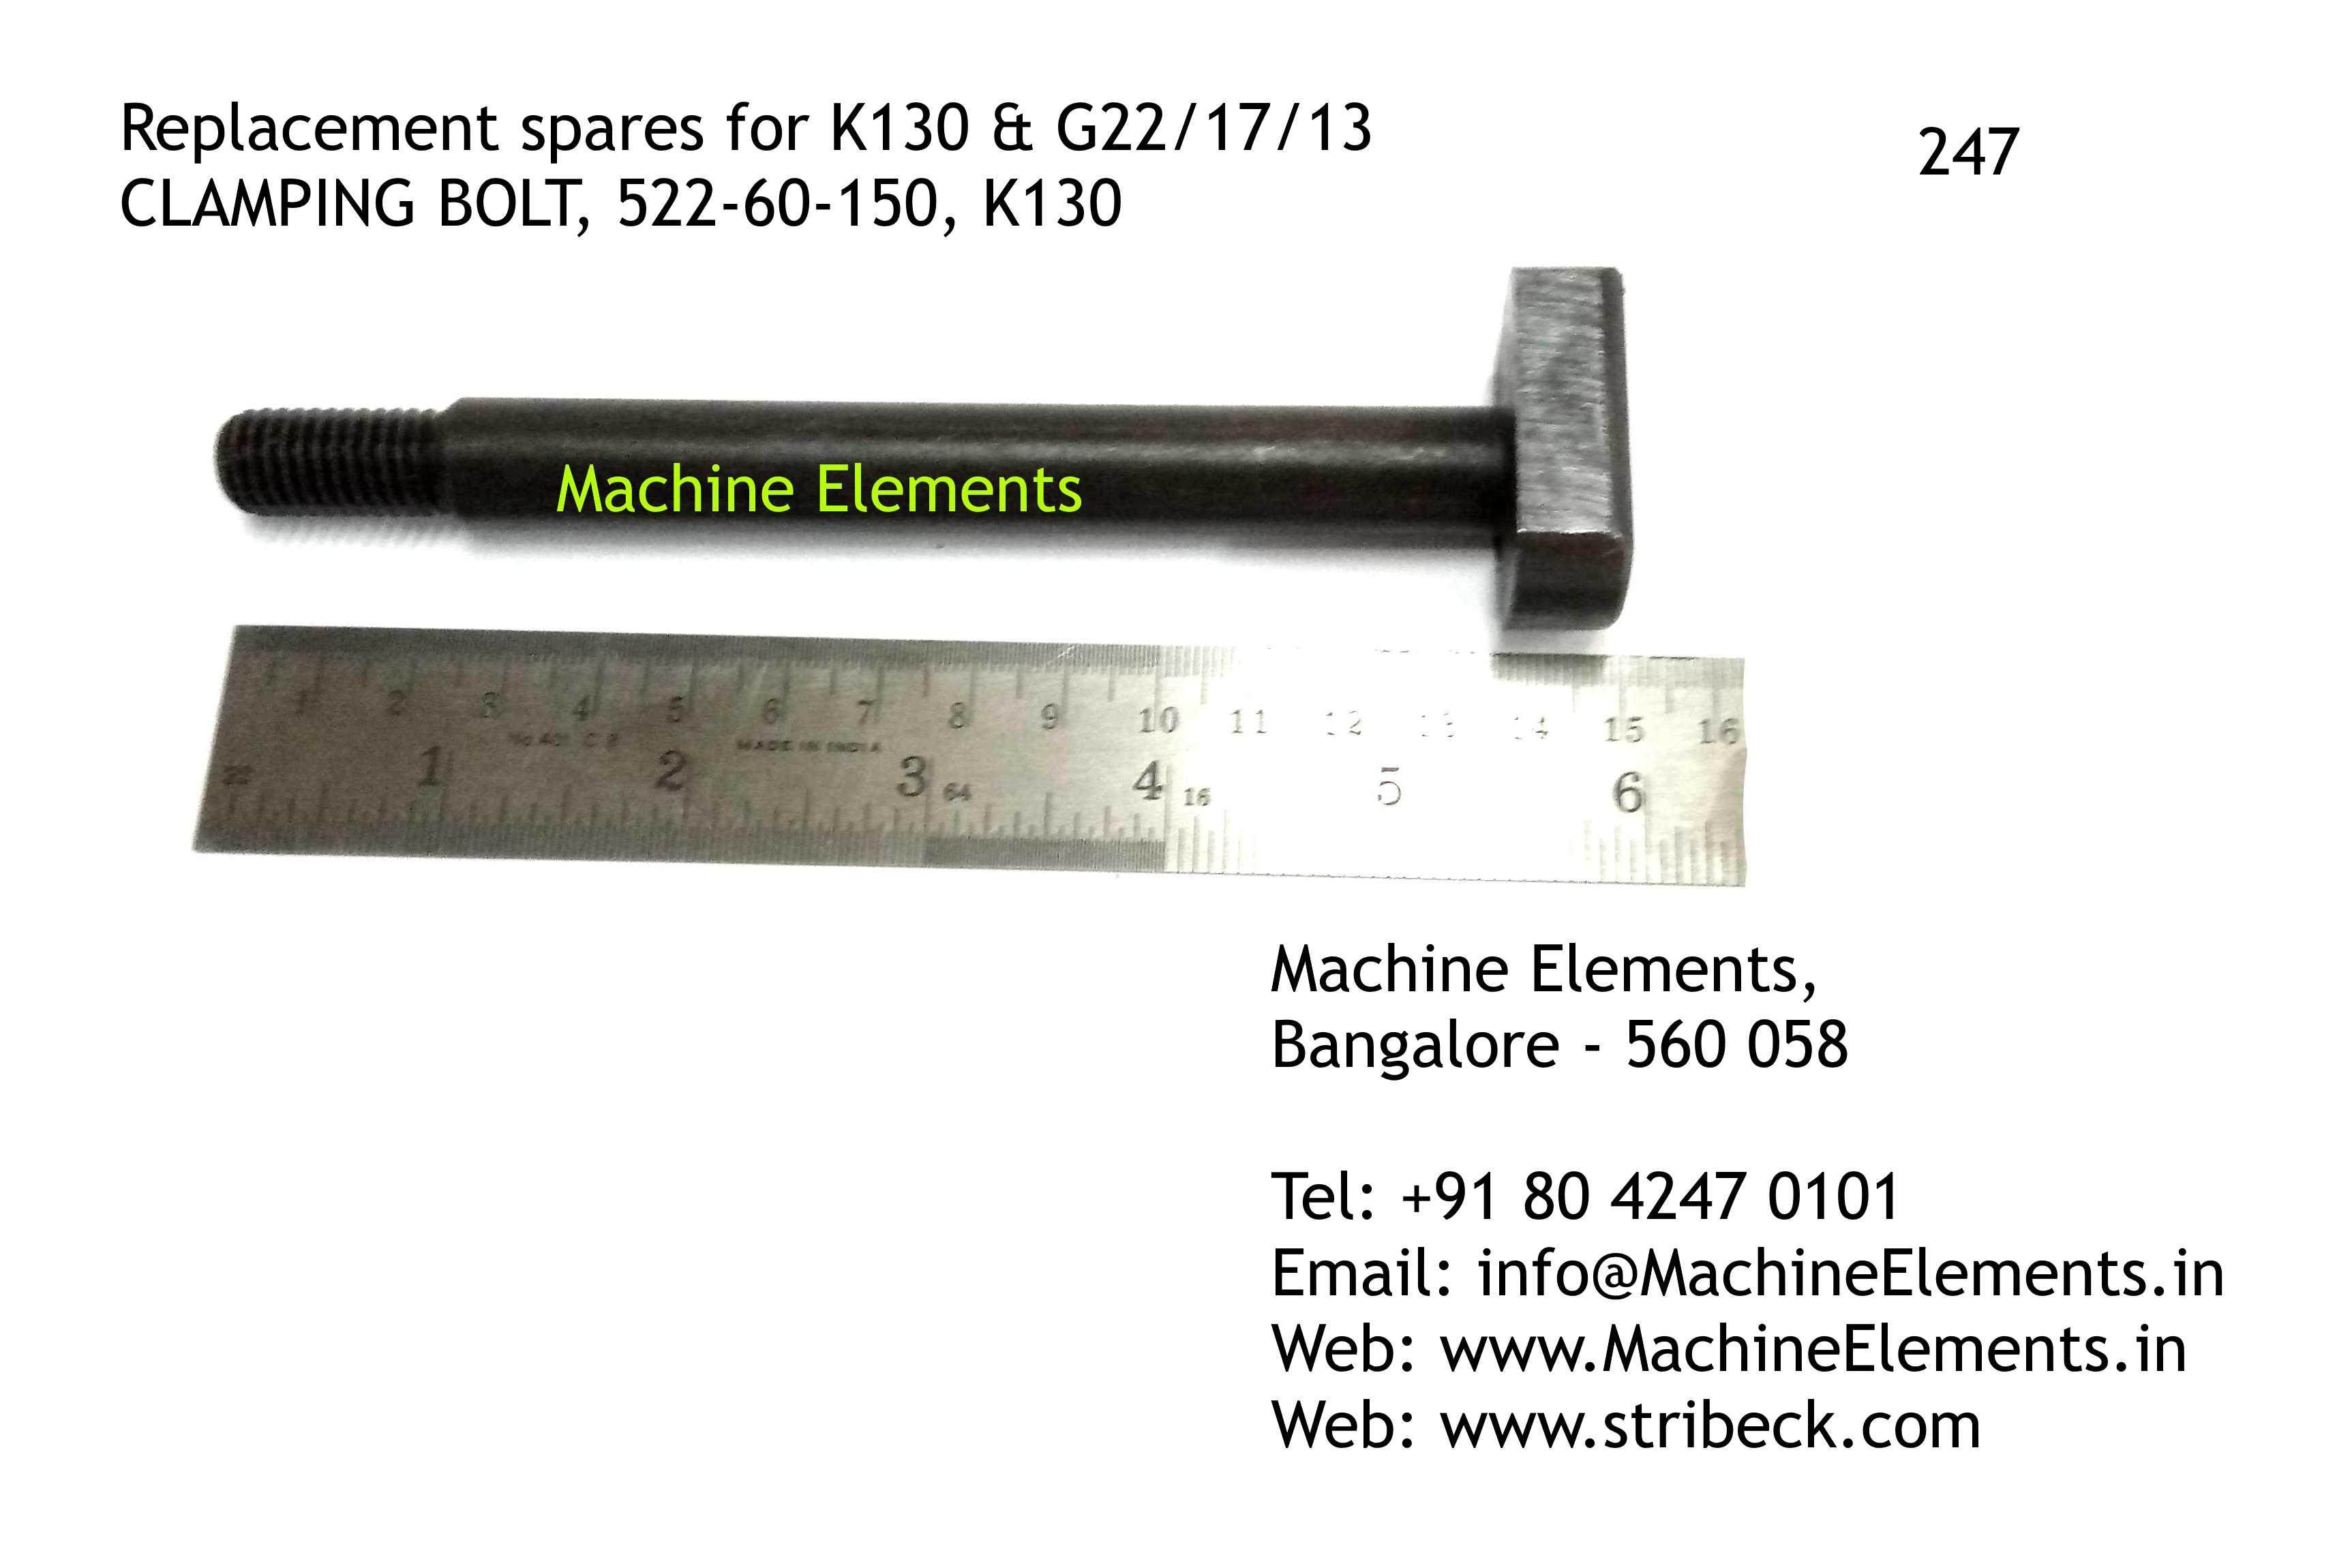 CLAMPING BOLT, 522-60-150, K130